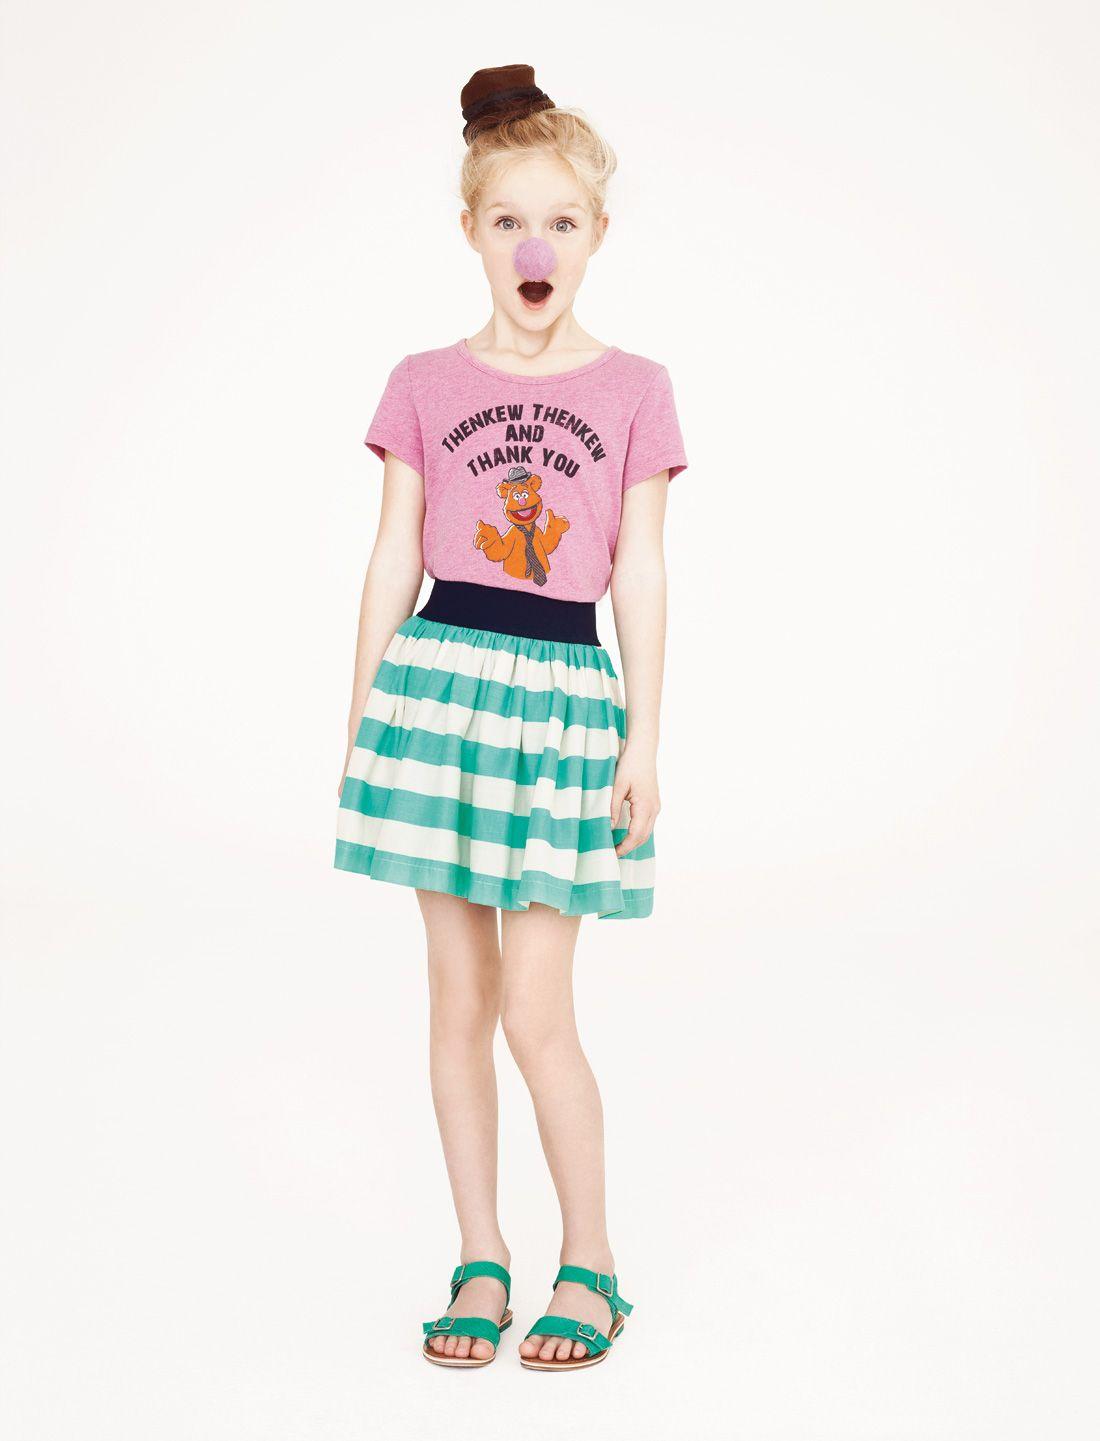 cb8c5423 Muppet Show by Tommy Hilfiger | Childrenswear | Kids fashion, Tommy ...